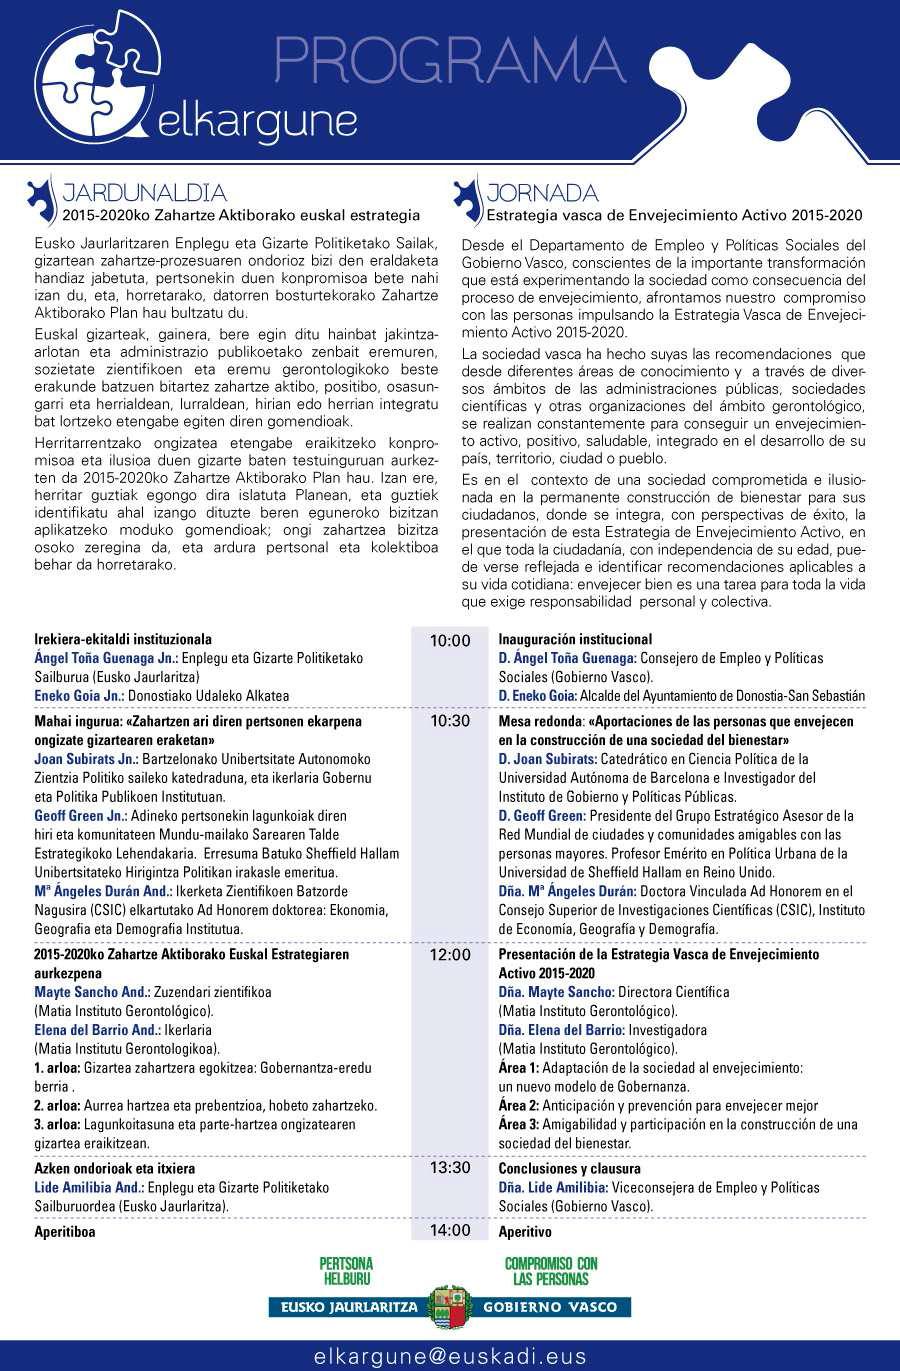 Programa de la jornada celebrada en día 18/09/2015 en Donostia / San Sebastián